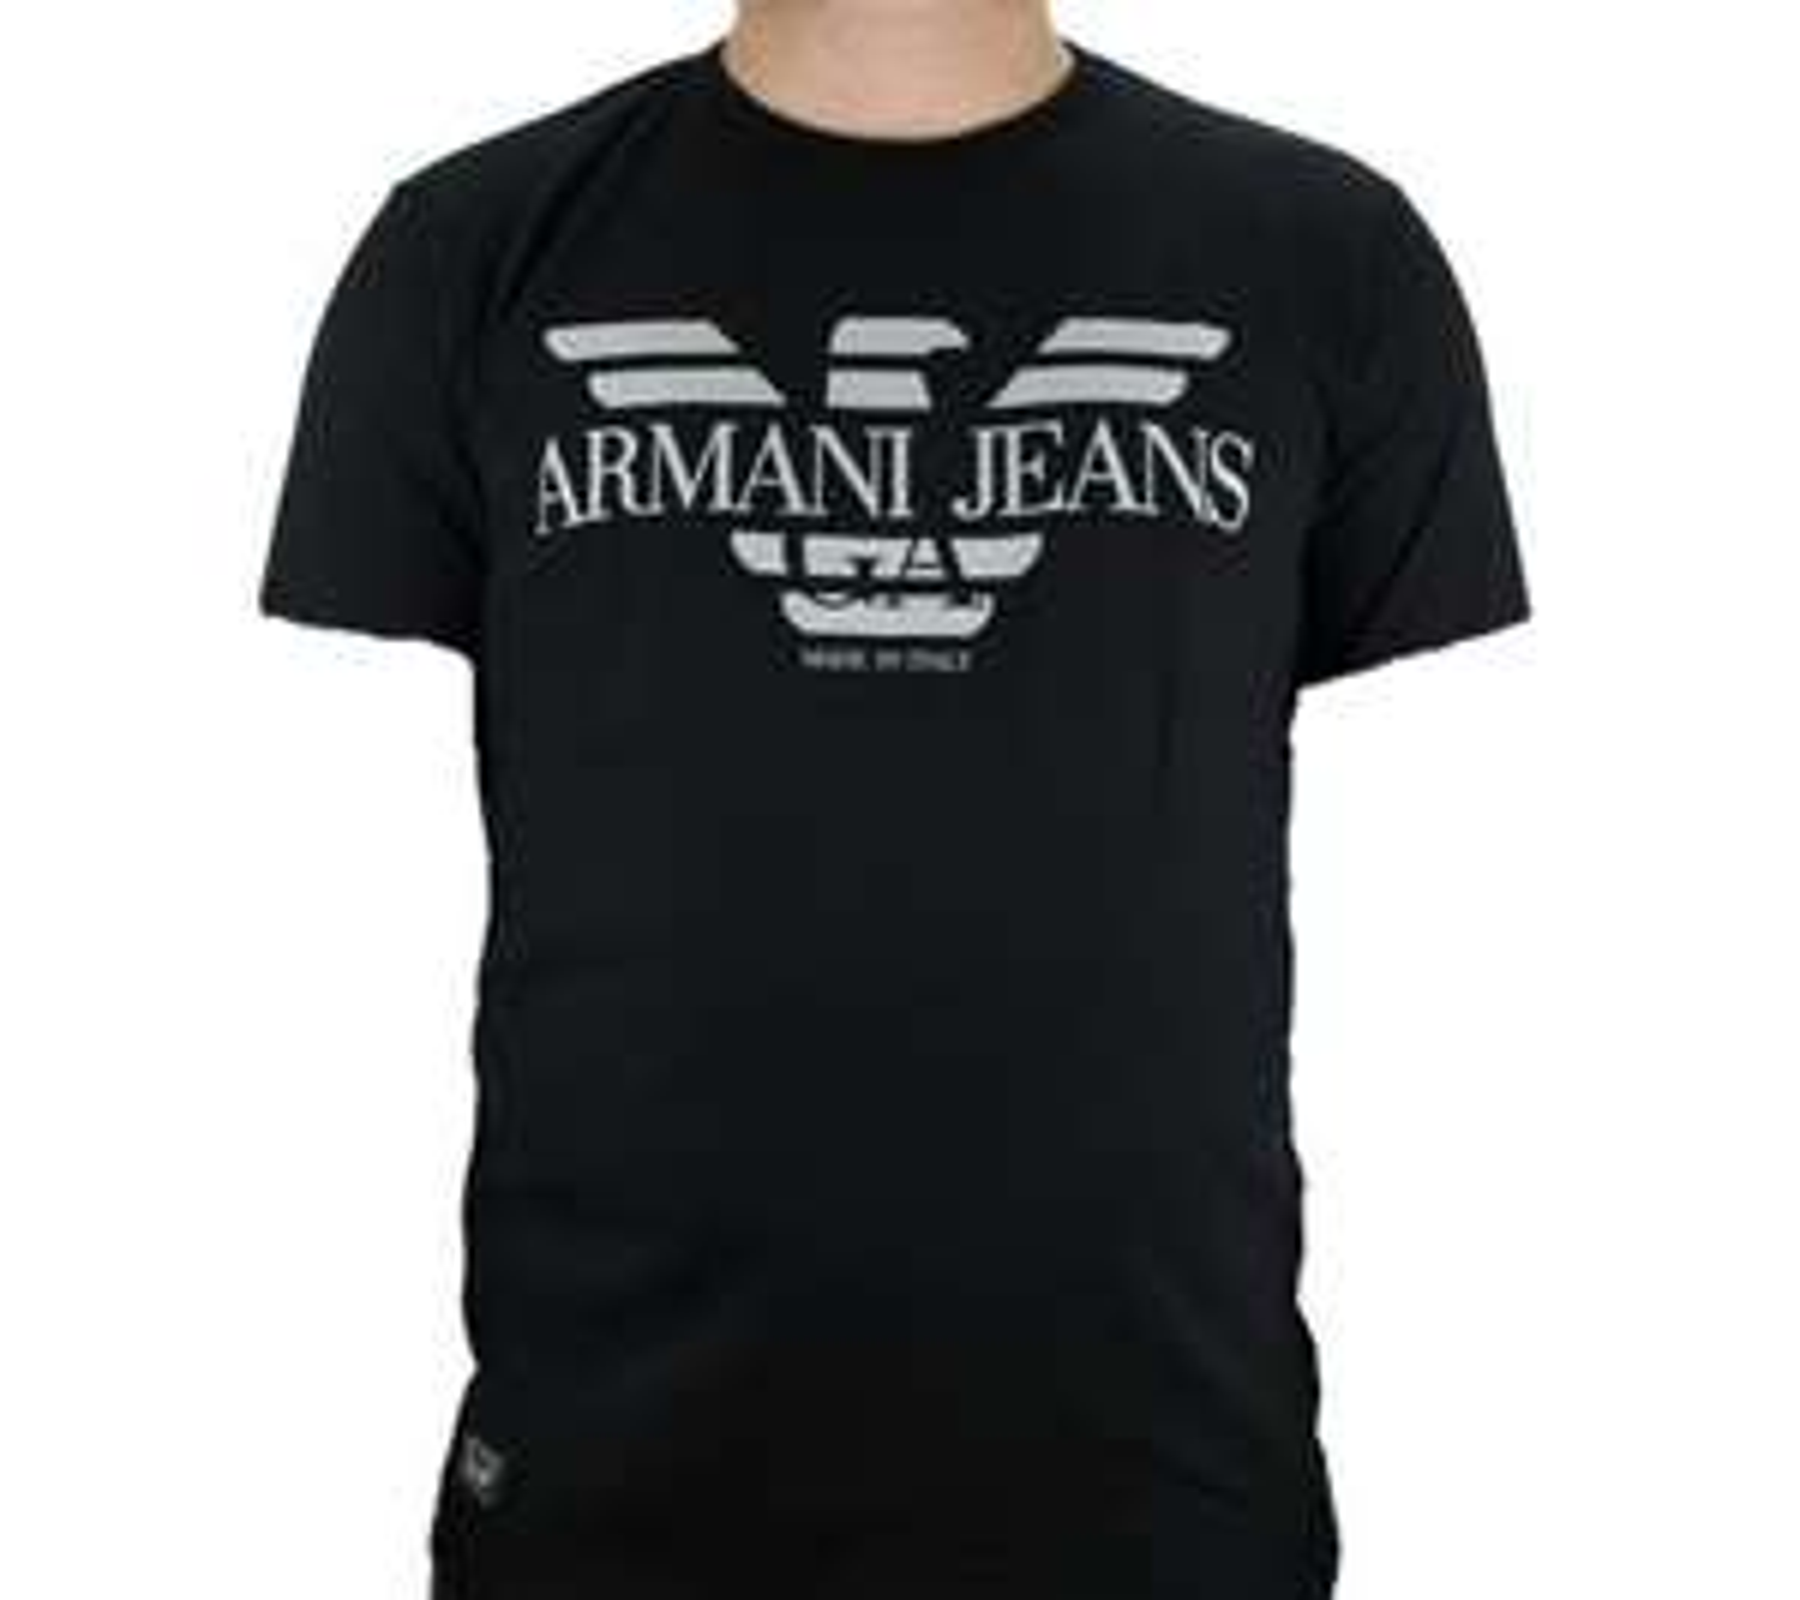 Armani Jeans T-Shirts - Größen S bis XL